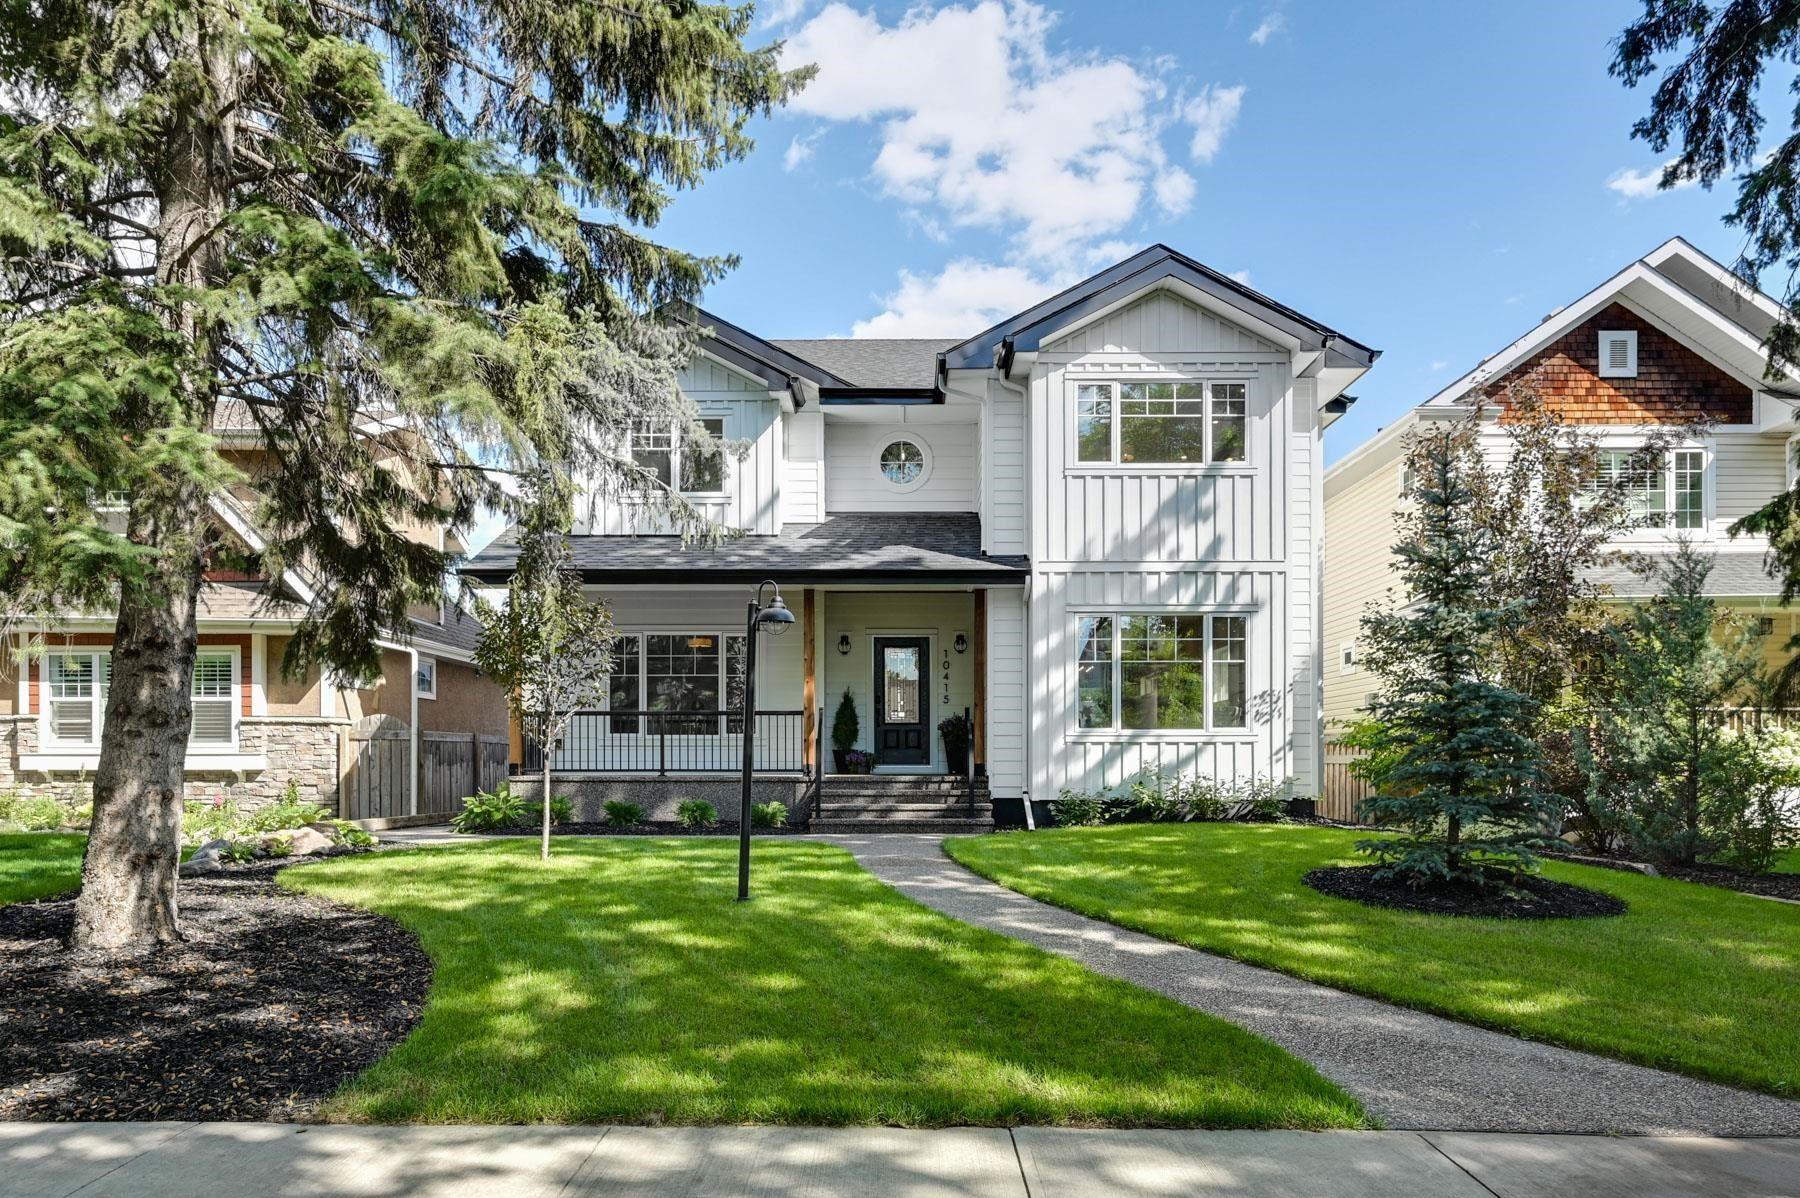 Main Photo: 10415 139 Street in Edmonton: Zone 11 House for sale : MLS®# E4260443